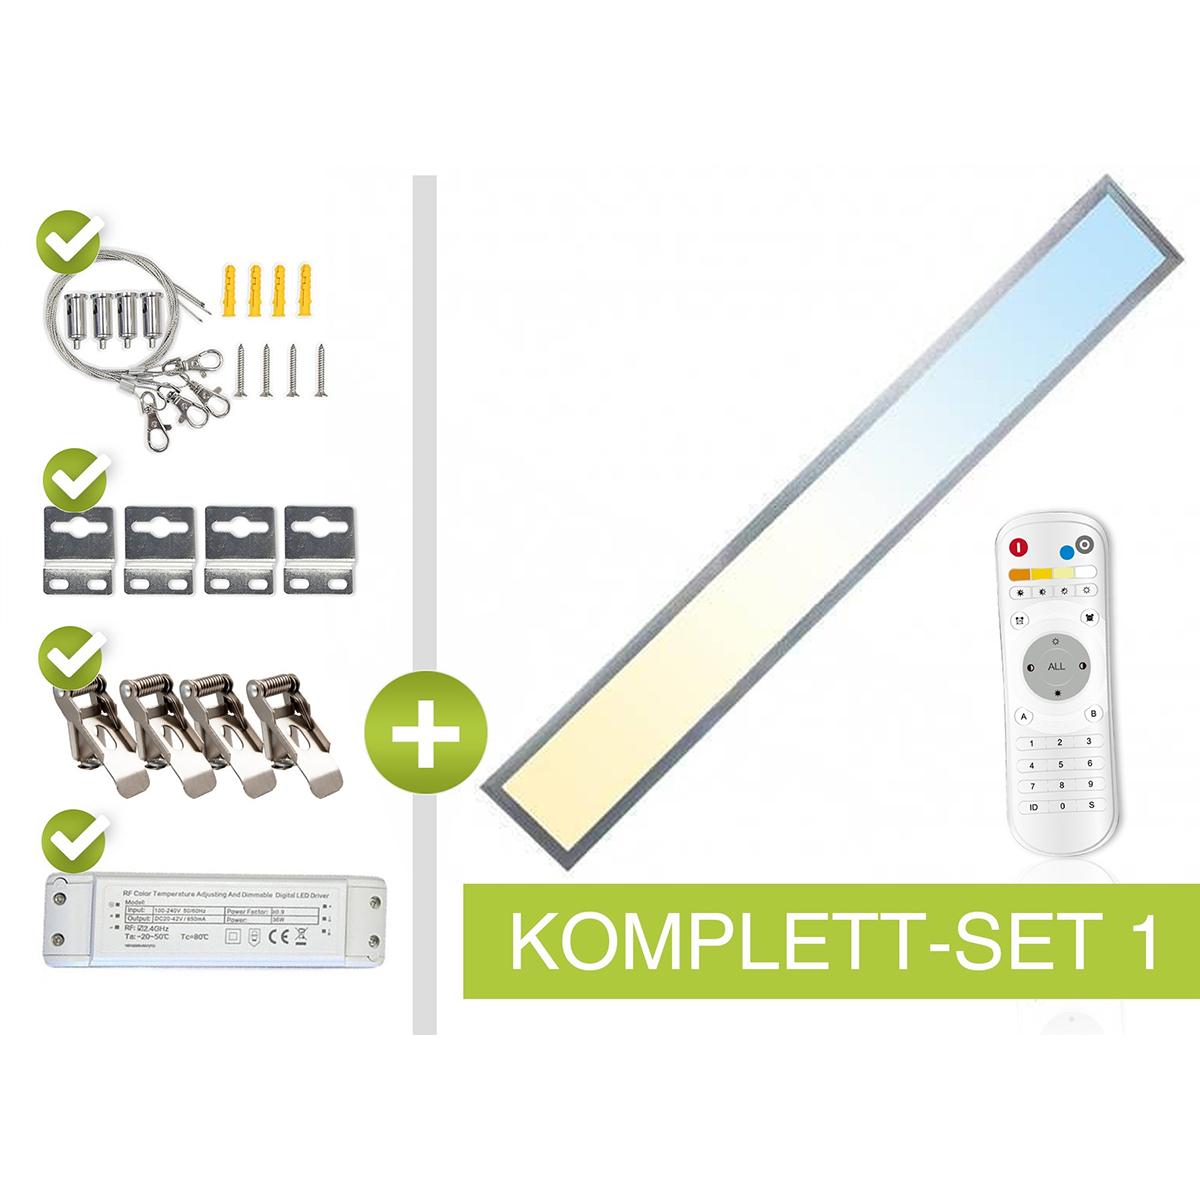 CCT LED Panel Set 1 120x15cm 36W 3000K-6000K